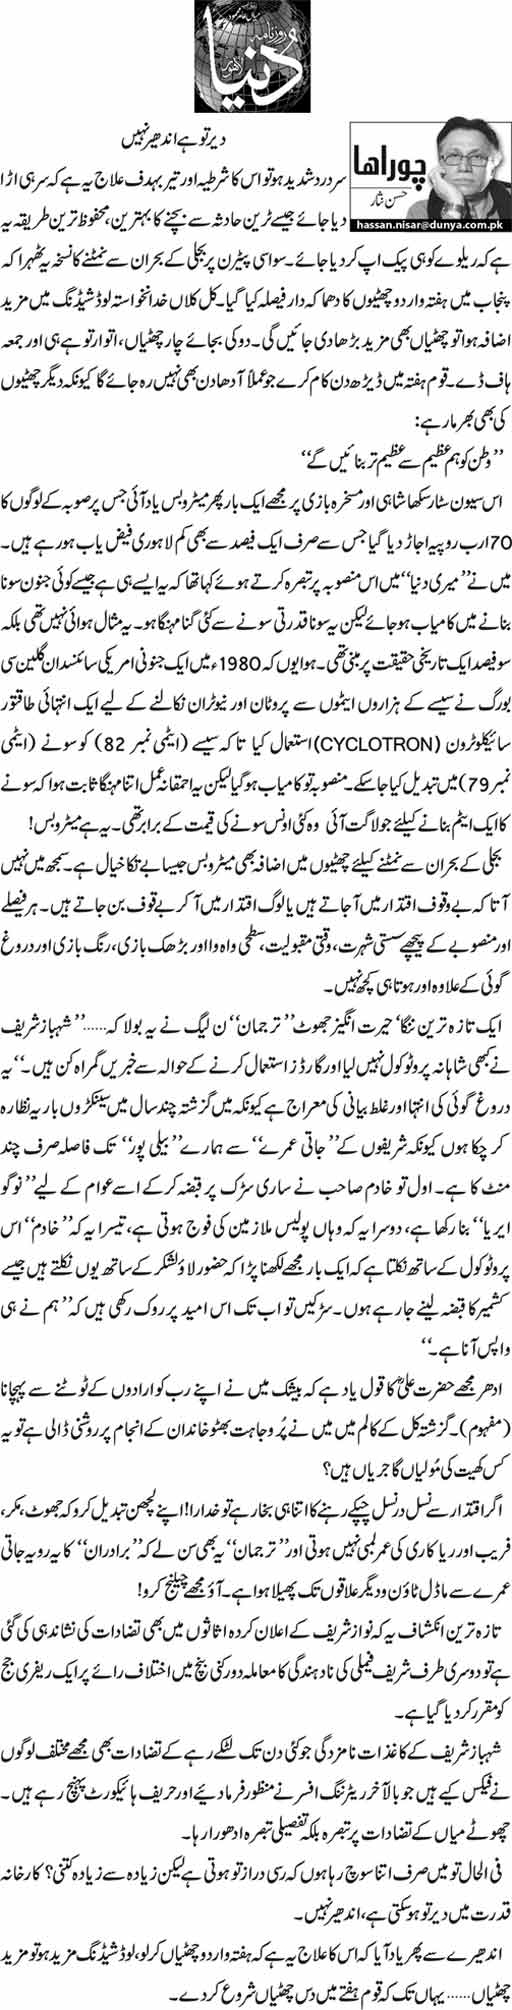 Dair To Hai Andhair Nahi - Hassan Nisar